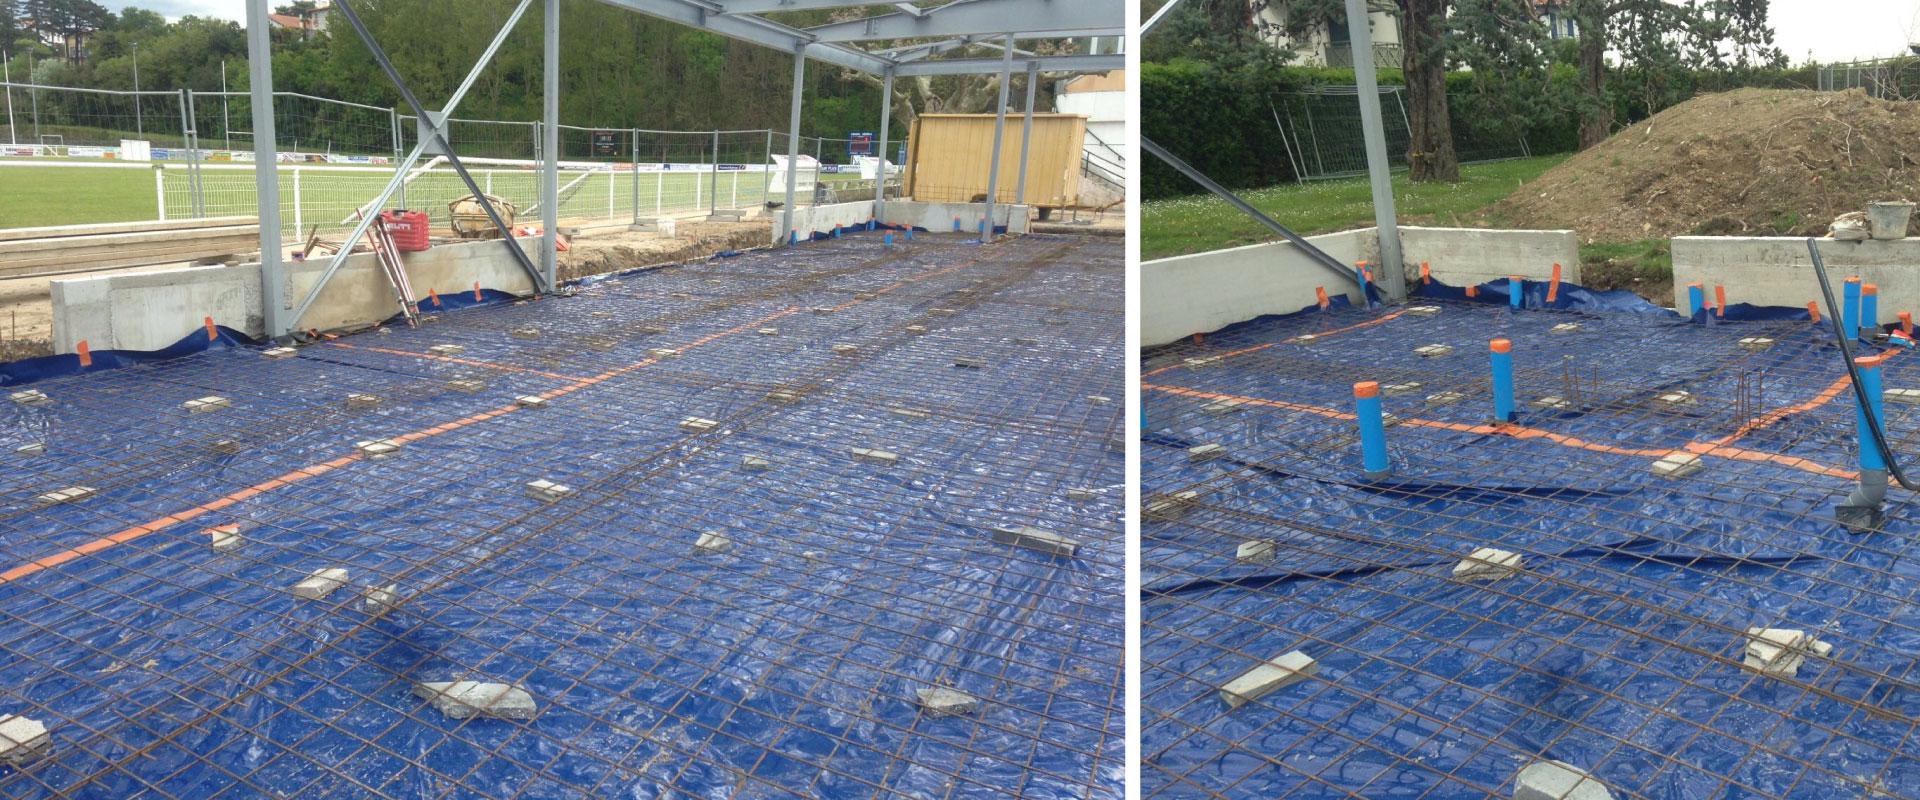 stade-hendayais-club-house-zubieta-constructions-dalle-beton